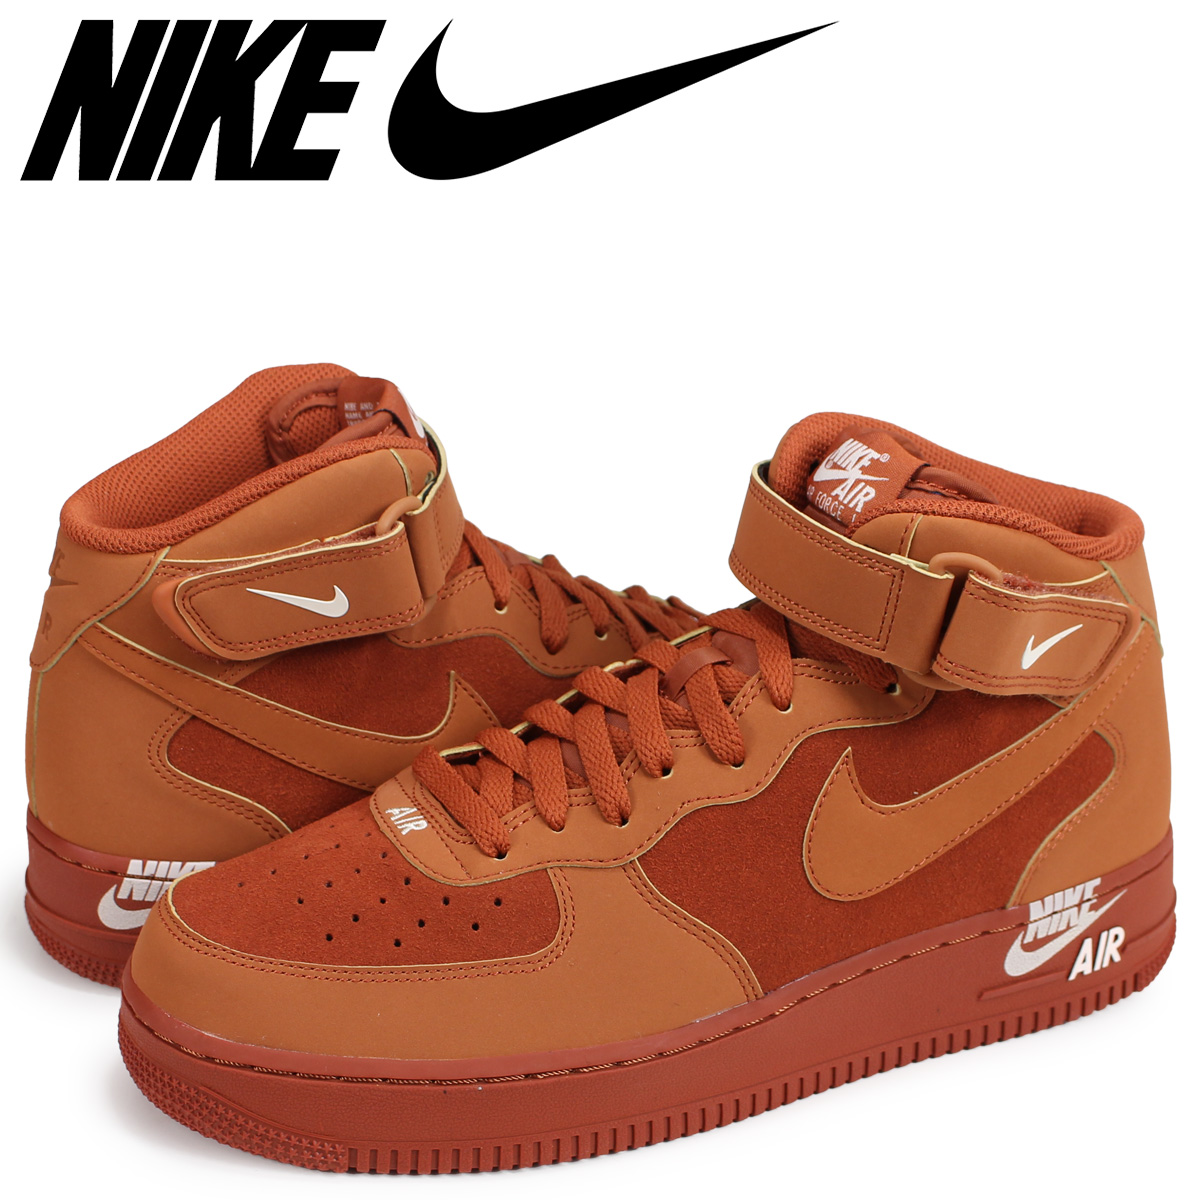 NIKE AIR FORCE 1 MID 07 Nike air force 1 sneakers men brown 315,123 207